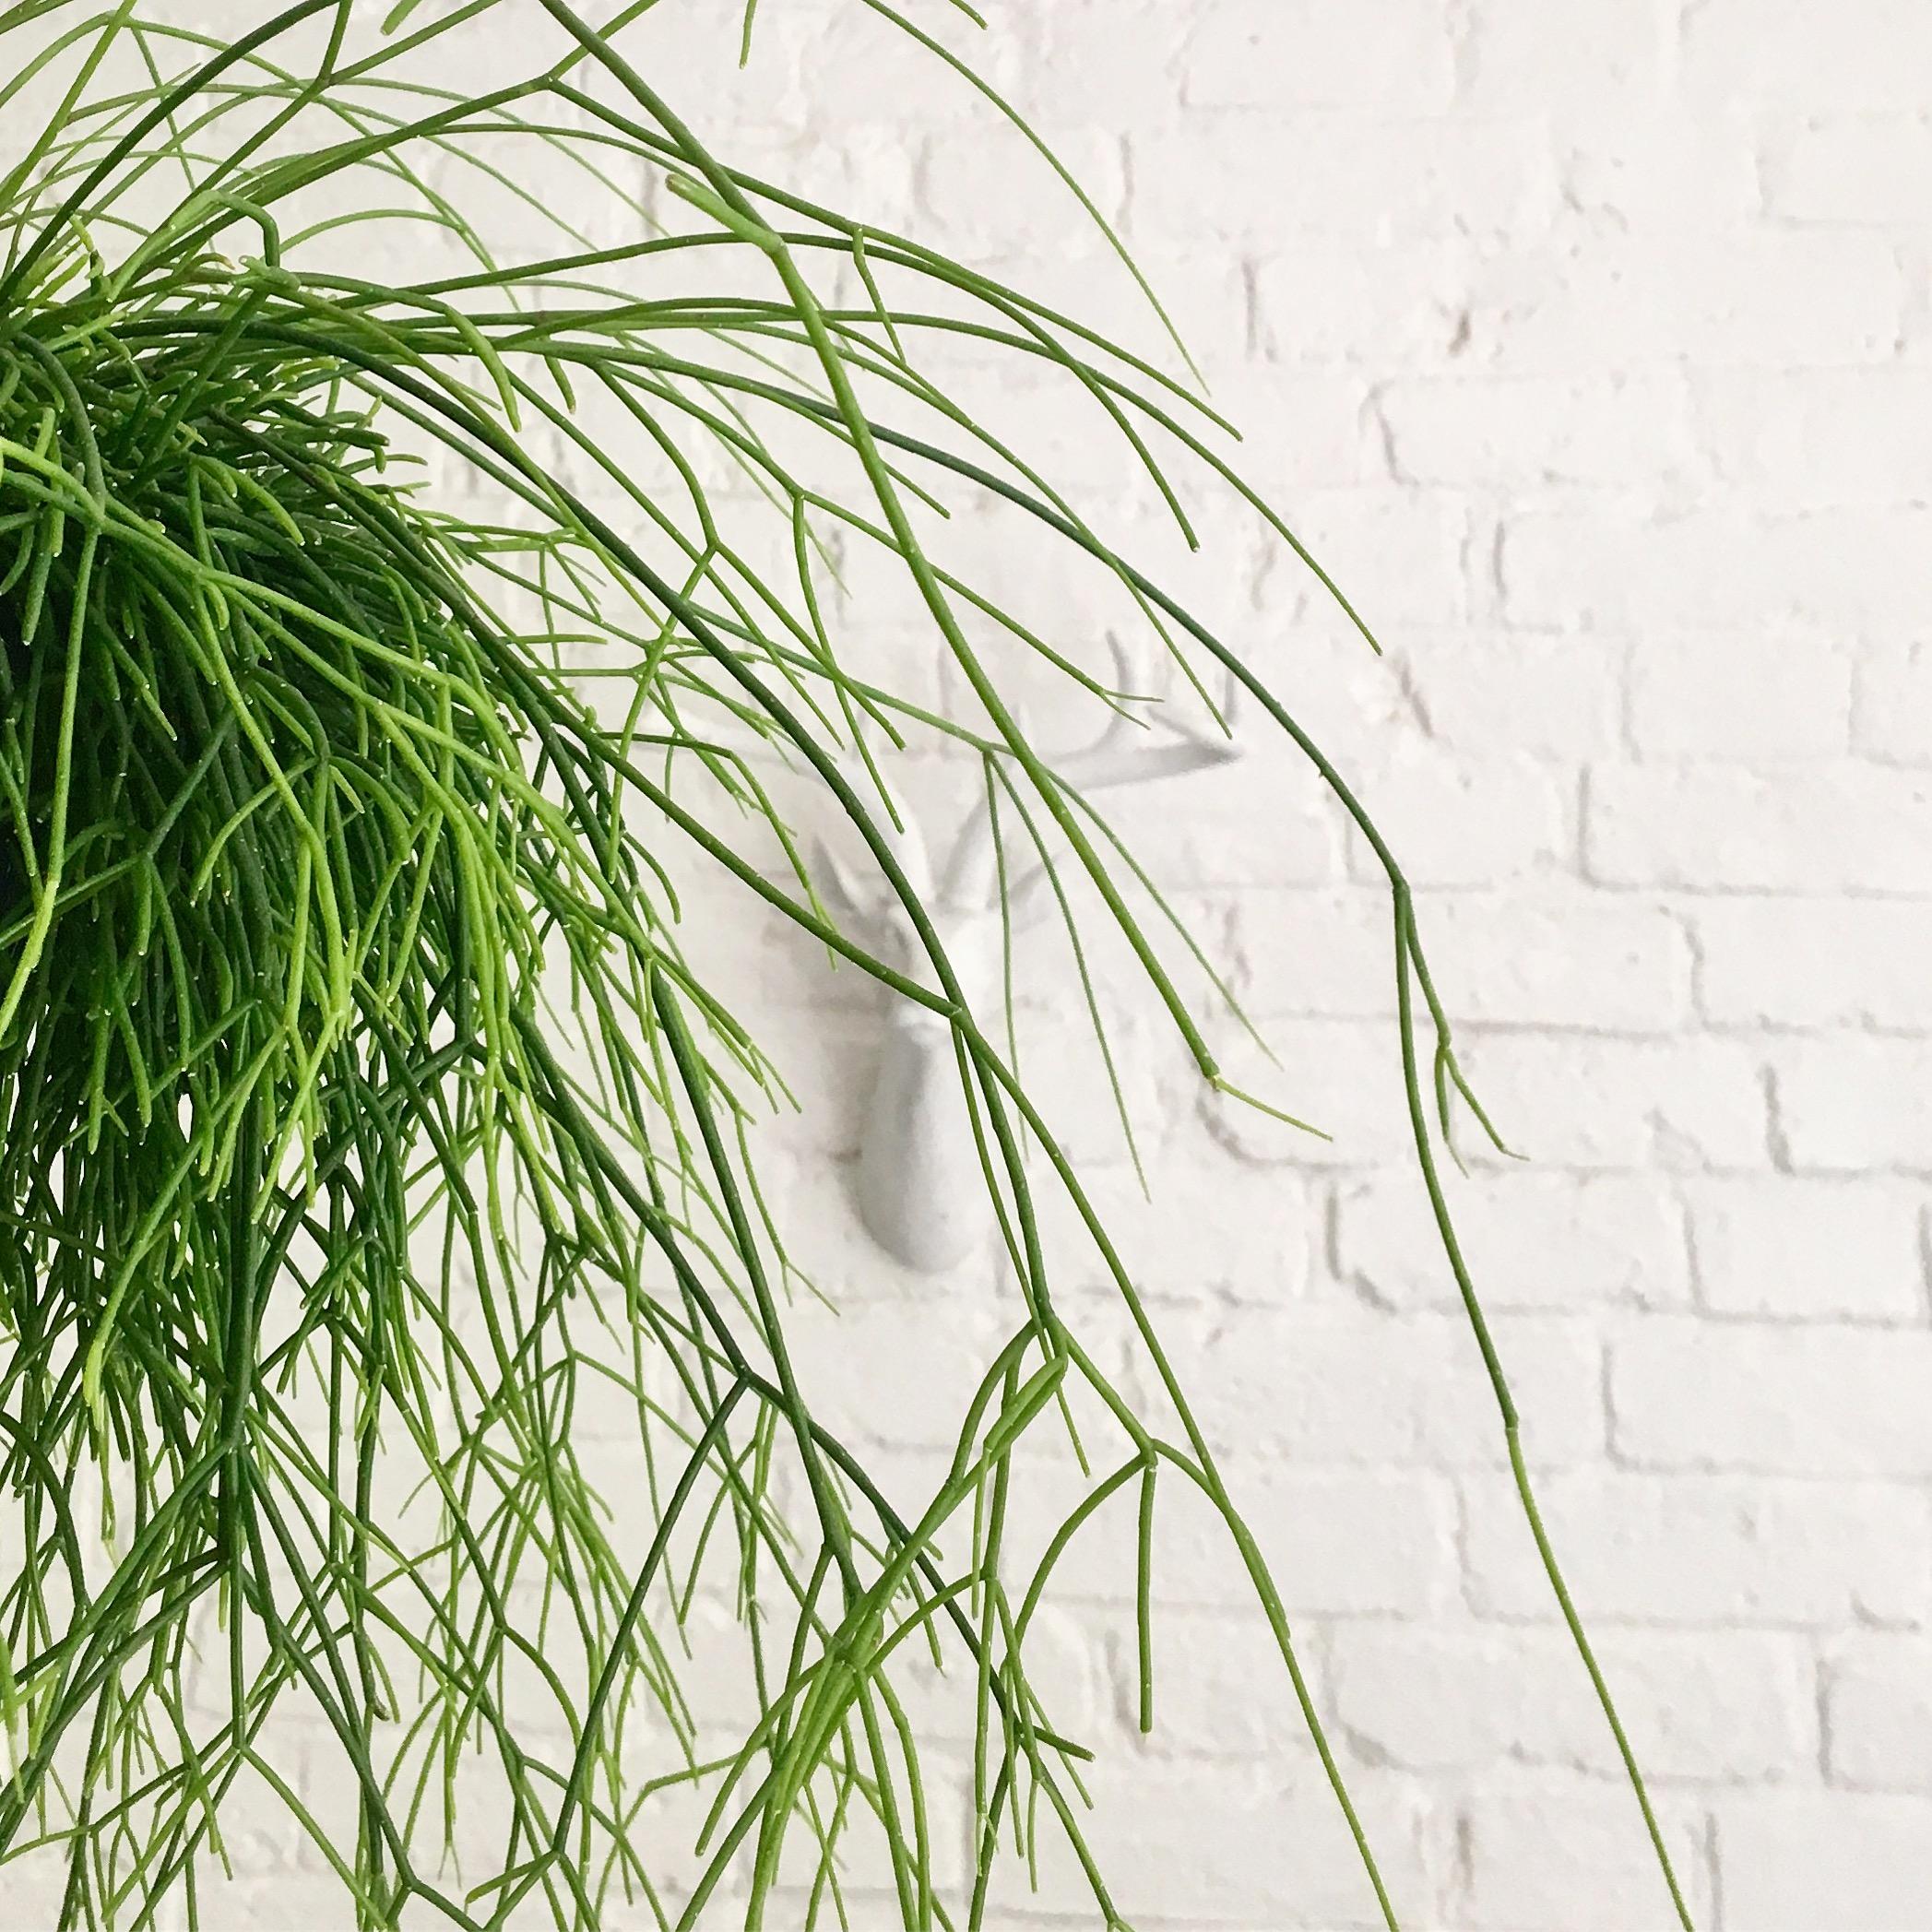 Hairy Alien Hanging Plant a.k.a. Mistletoe Cactus